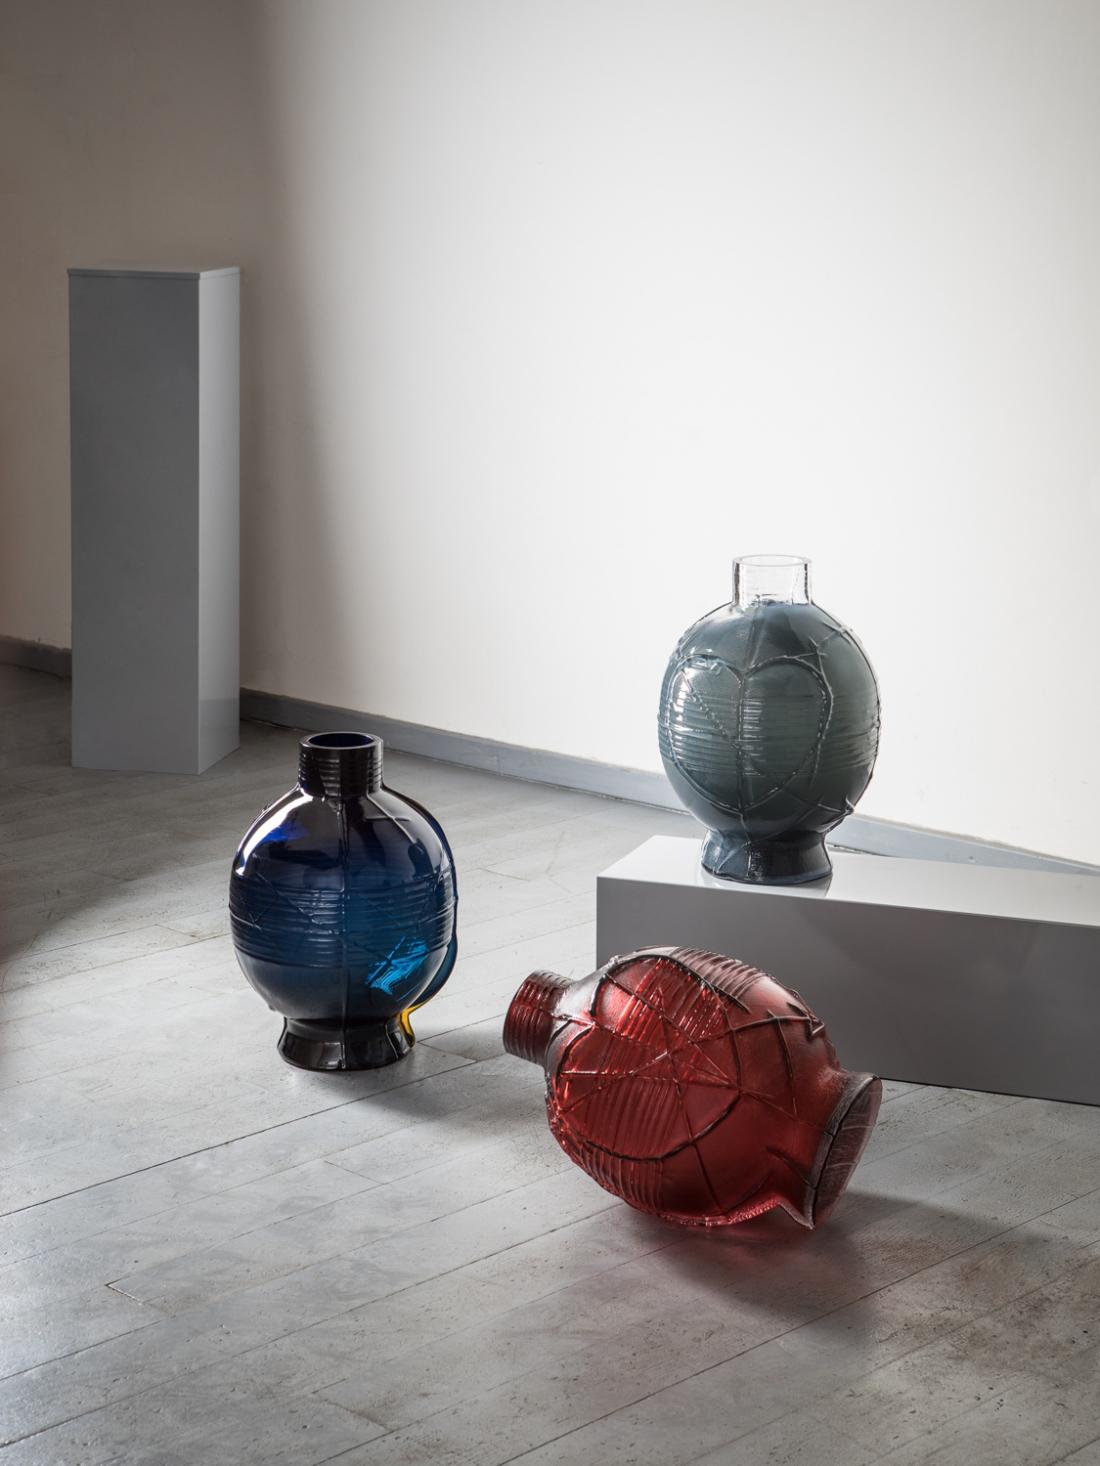 Sebastian Kitzberger, Wooden Vase, 2018. Photography by Tomas Slavik